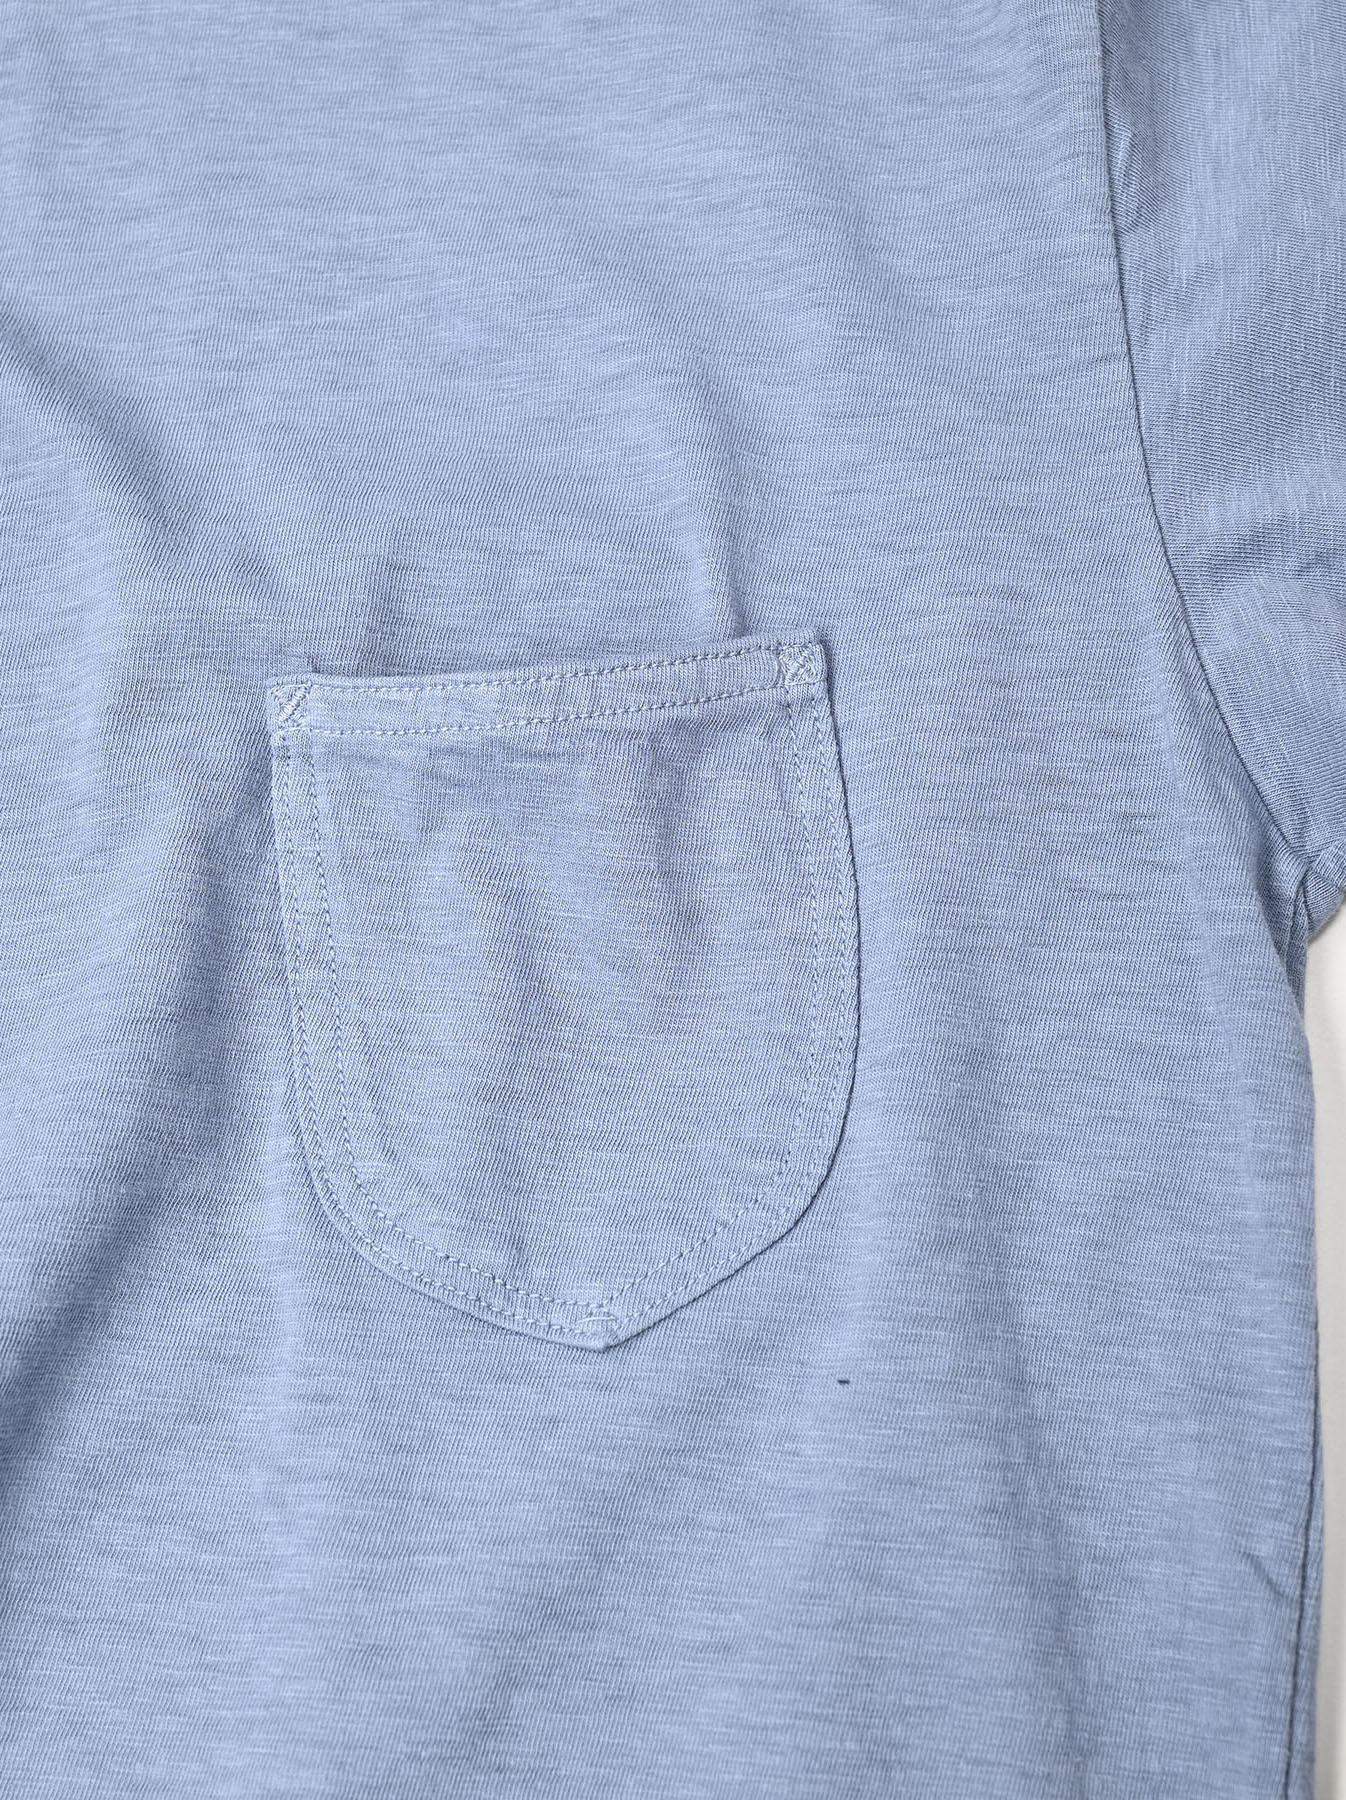 Zimbabwe Cotton 908 Ocean Long-sleeved T-shirt-11